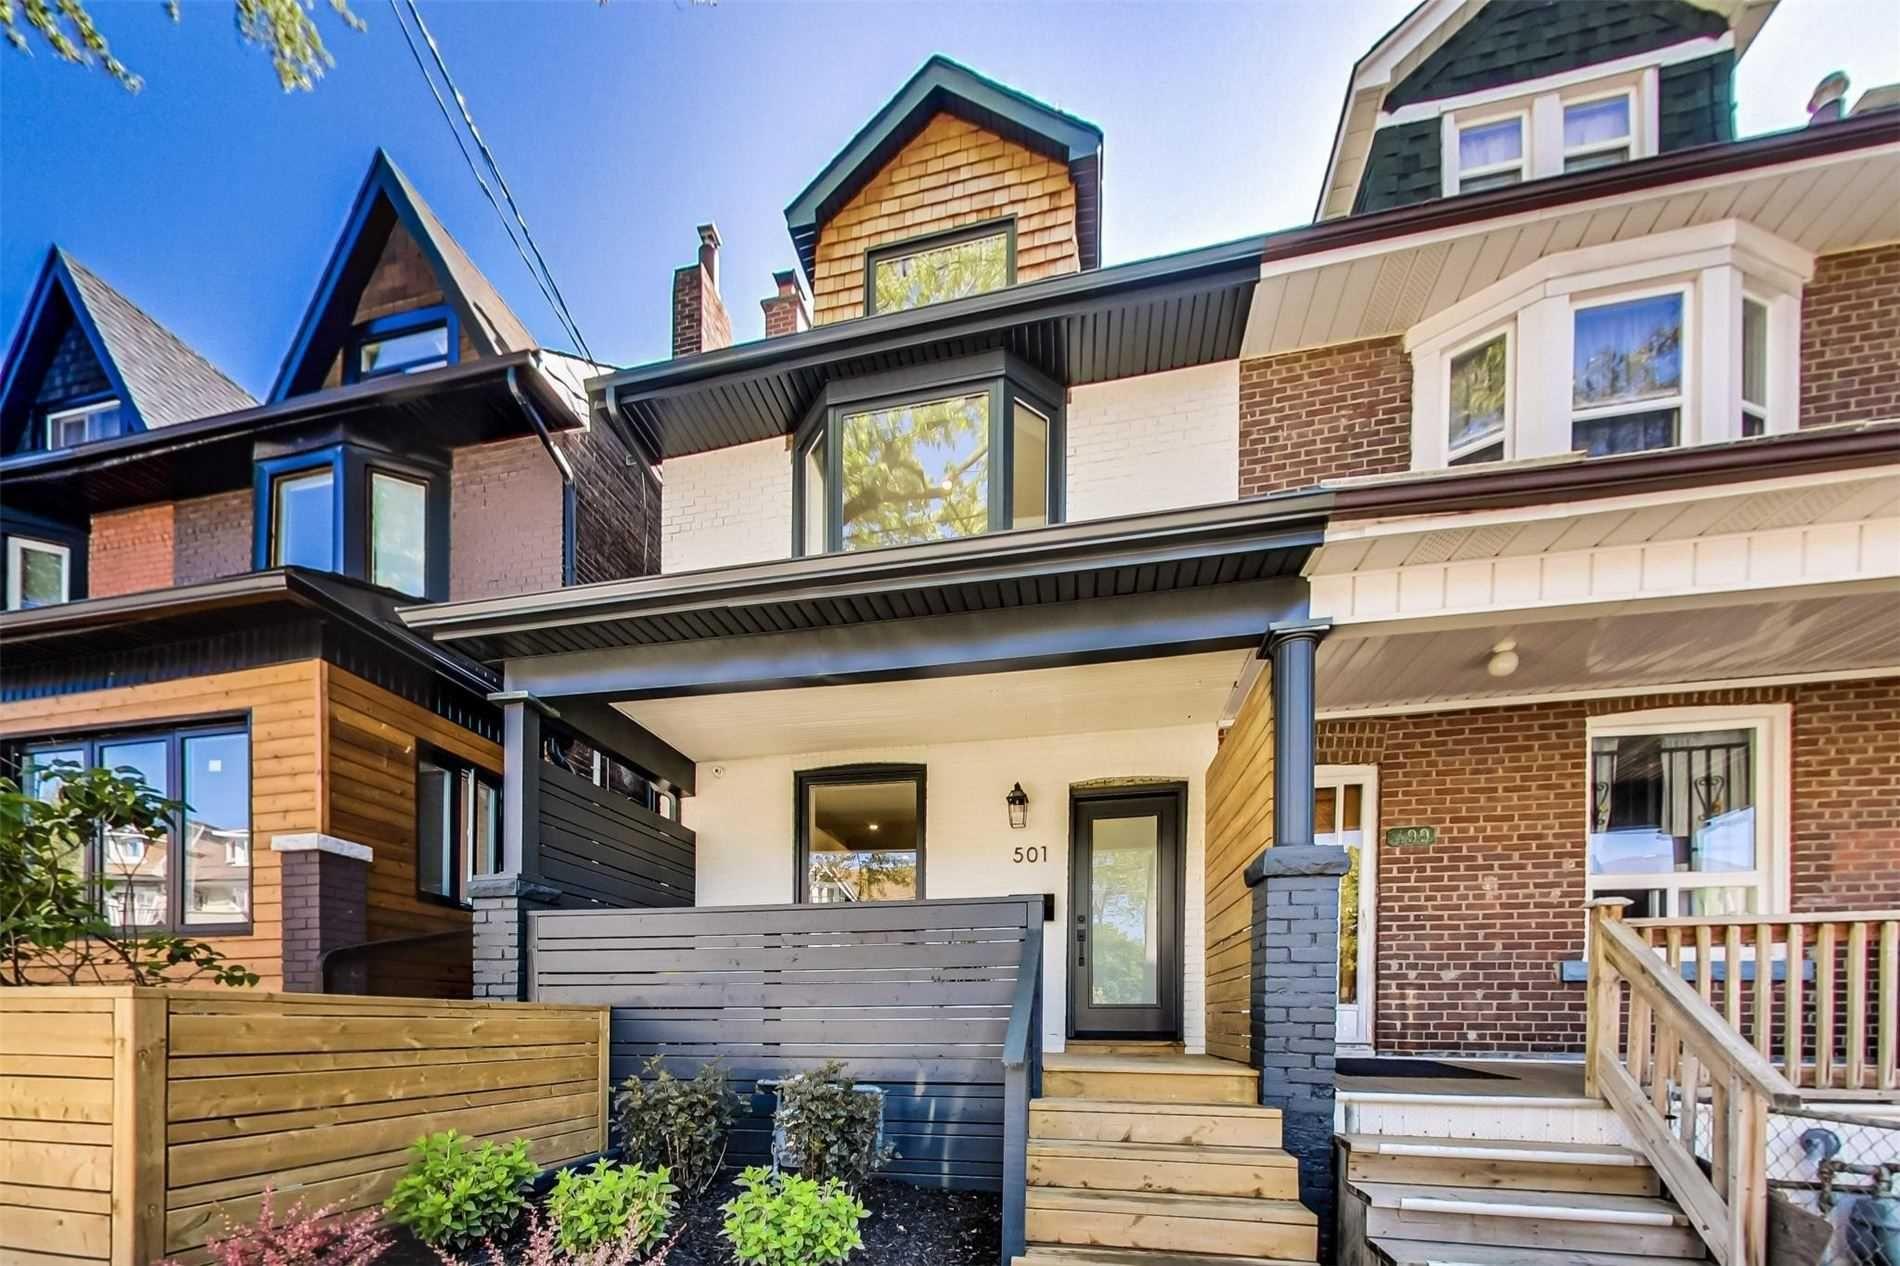 Main Photo: 501C Carlaw Avenue in Toronto: South Riverdale House (2 1/2 Storey) for lease (Toronto E01)  : MLS®# E4800640